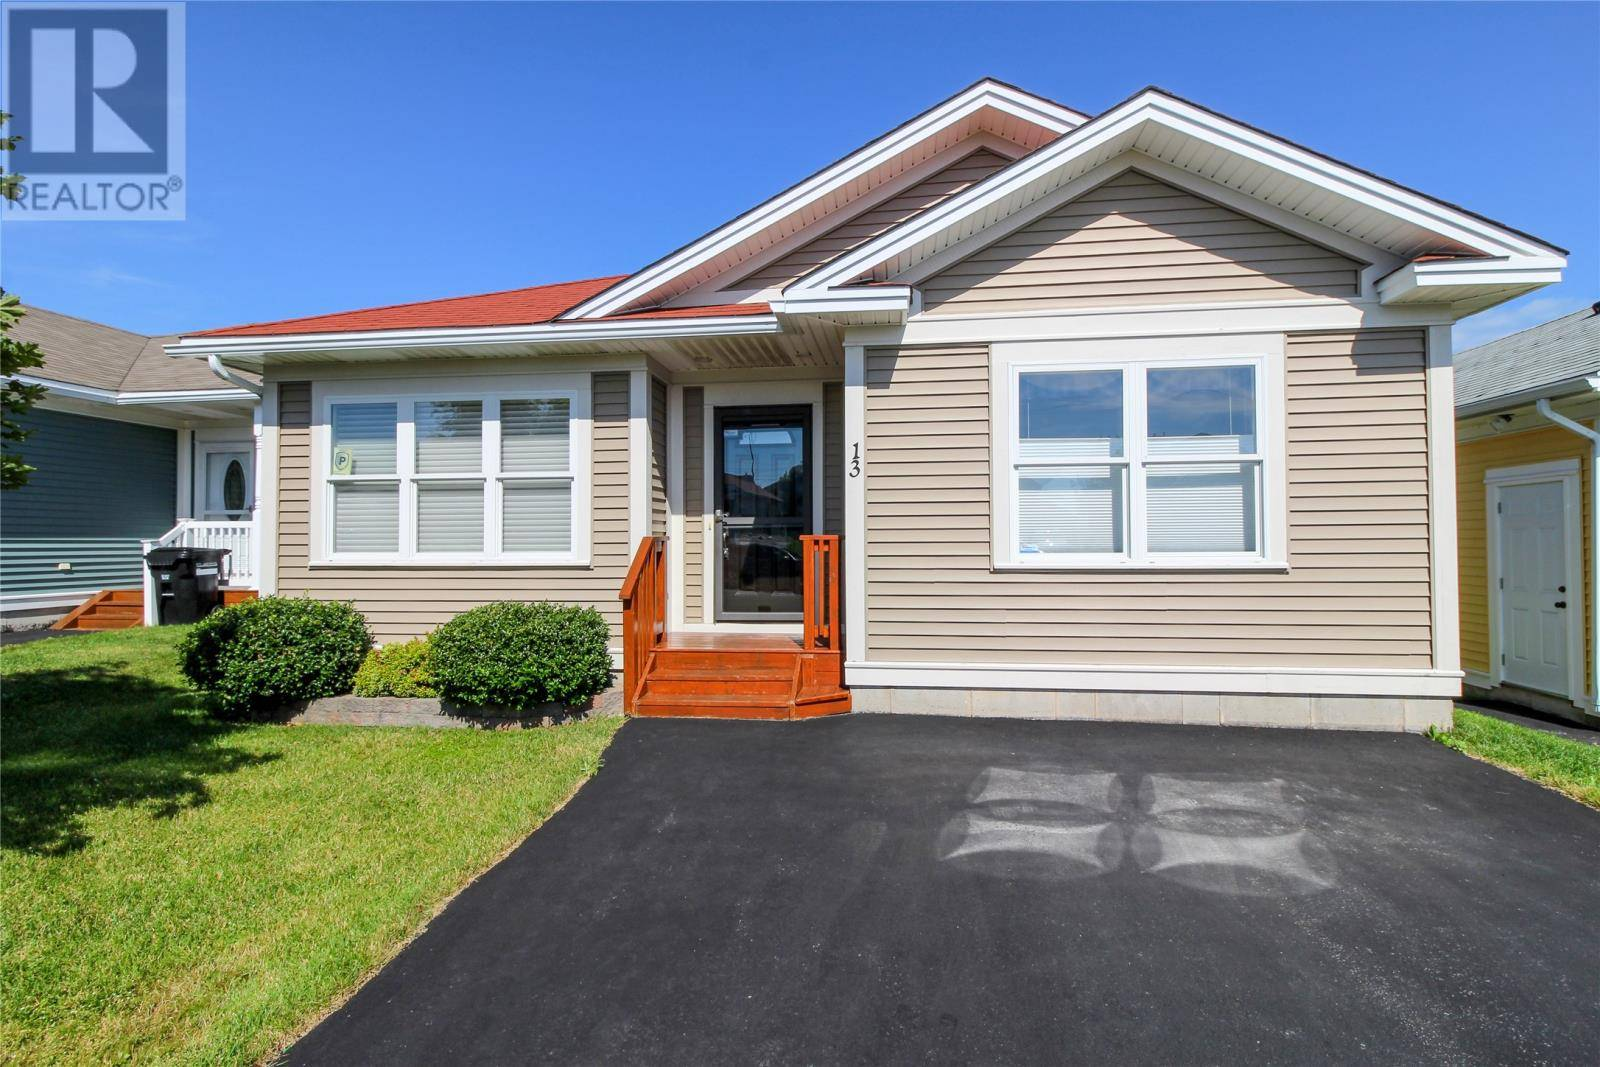 House for sale at 13 Shortall St St. John's Newfoundland - MLS: 1201016